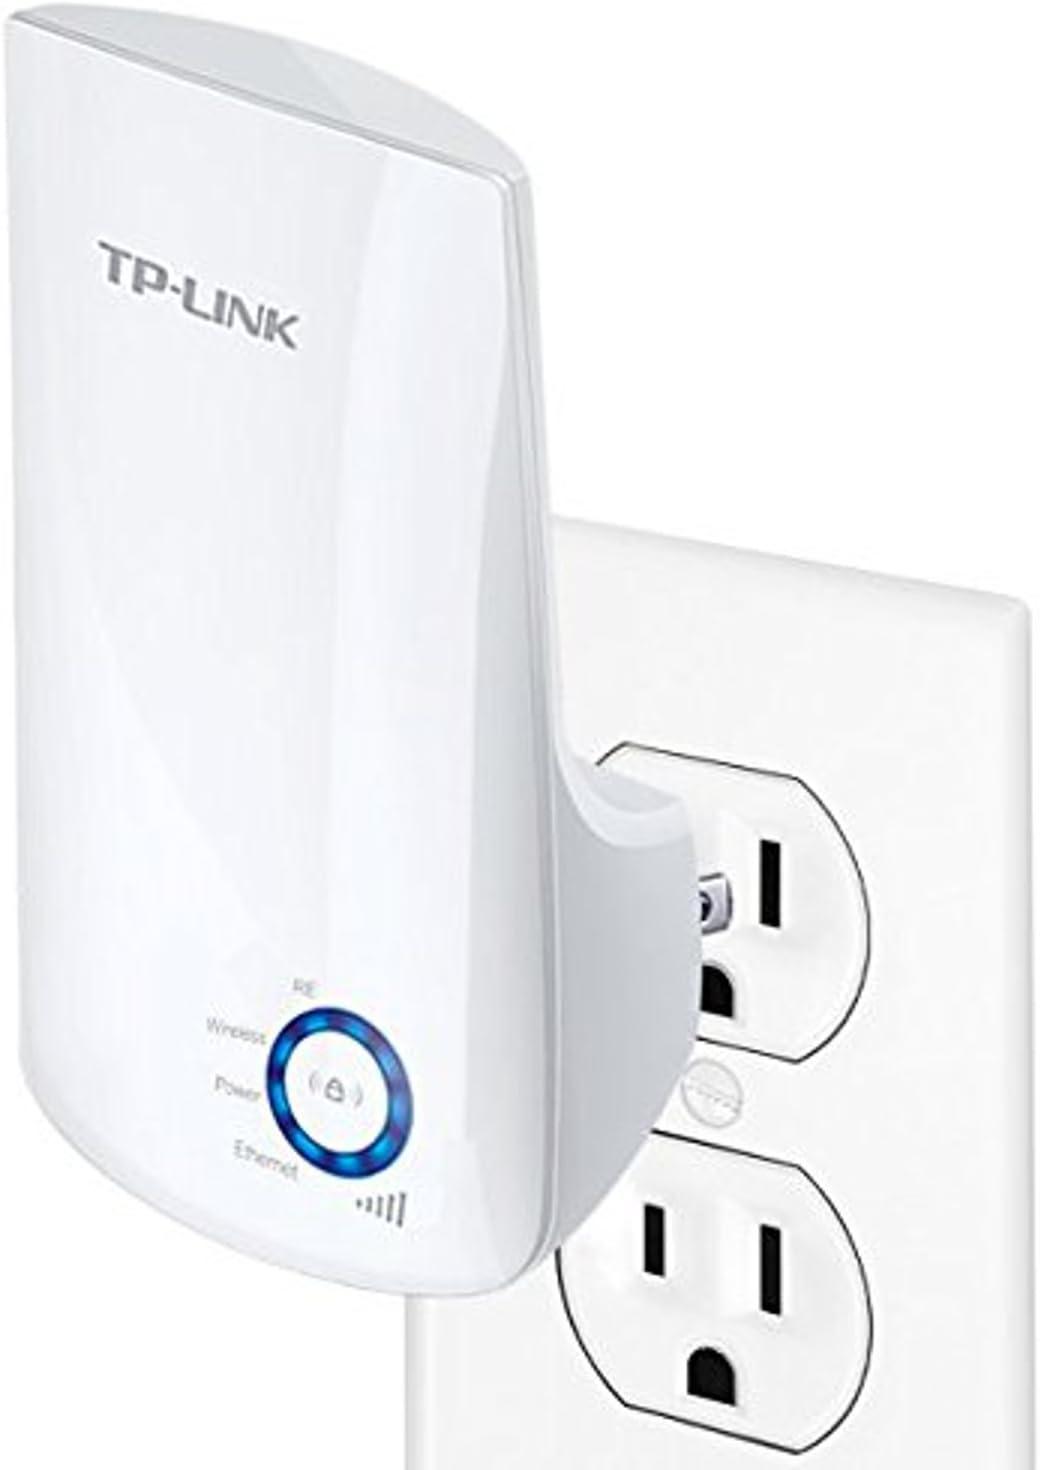 TP-Link N300 Wi-Fi Range Extender (TL-WA850RE) (Renewed)